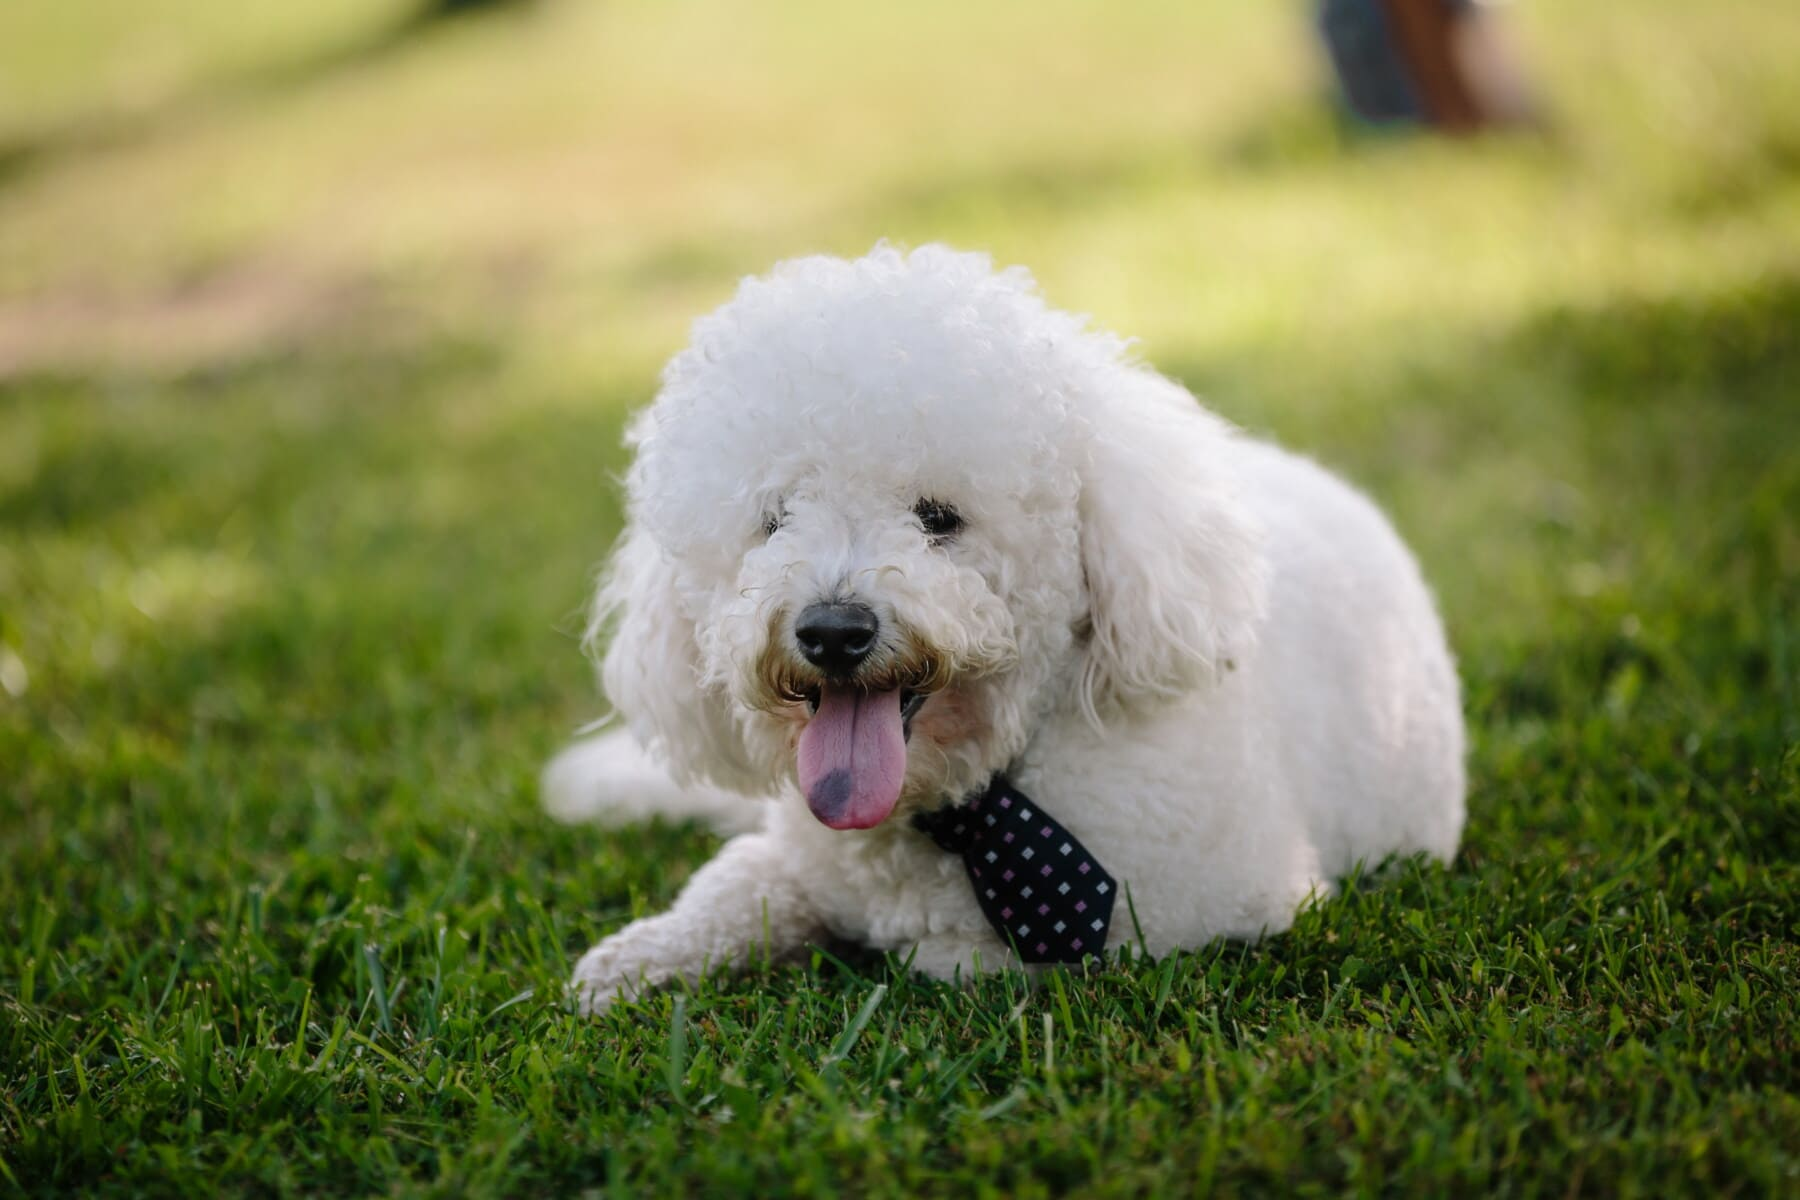 dog, adorable, collar, elegant, tie, fancy, trendy, style, white, purebred